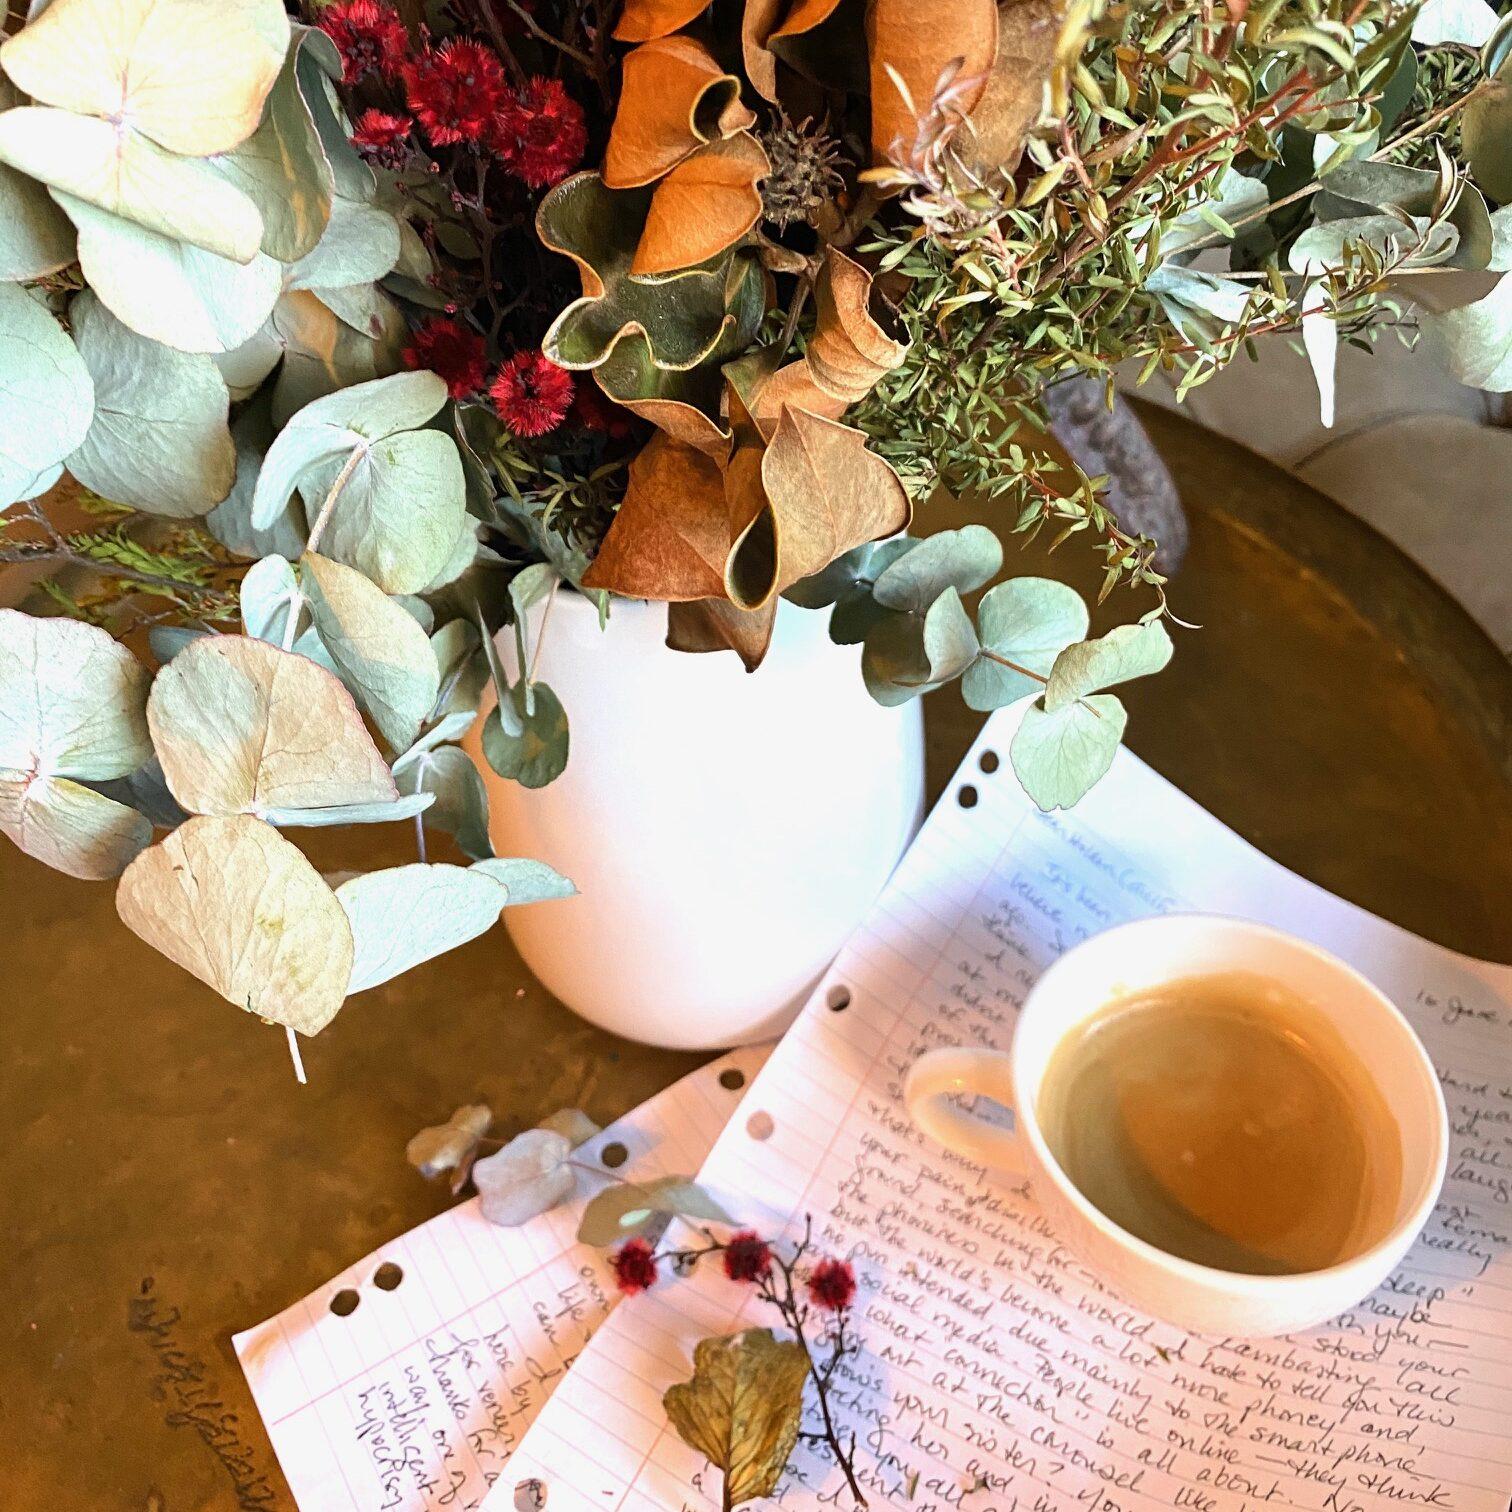 Letter to Holden Caulfield